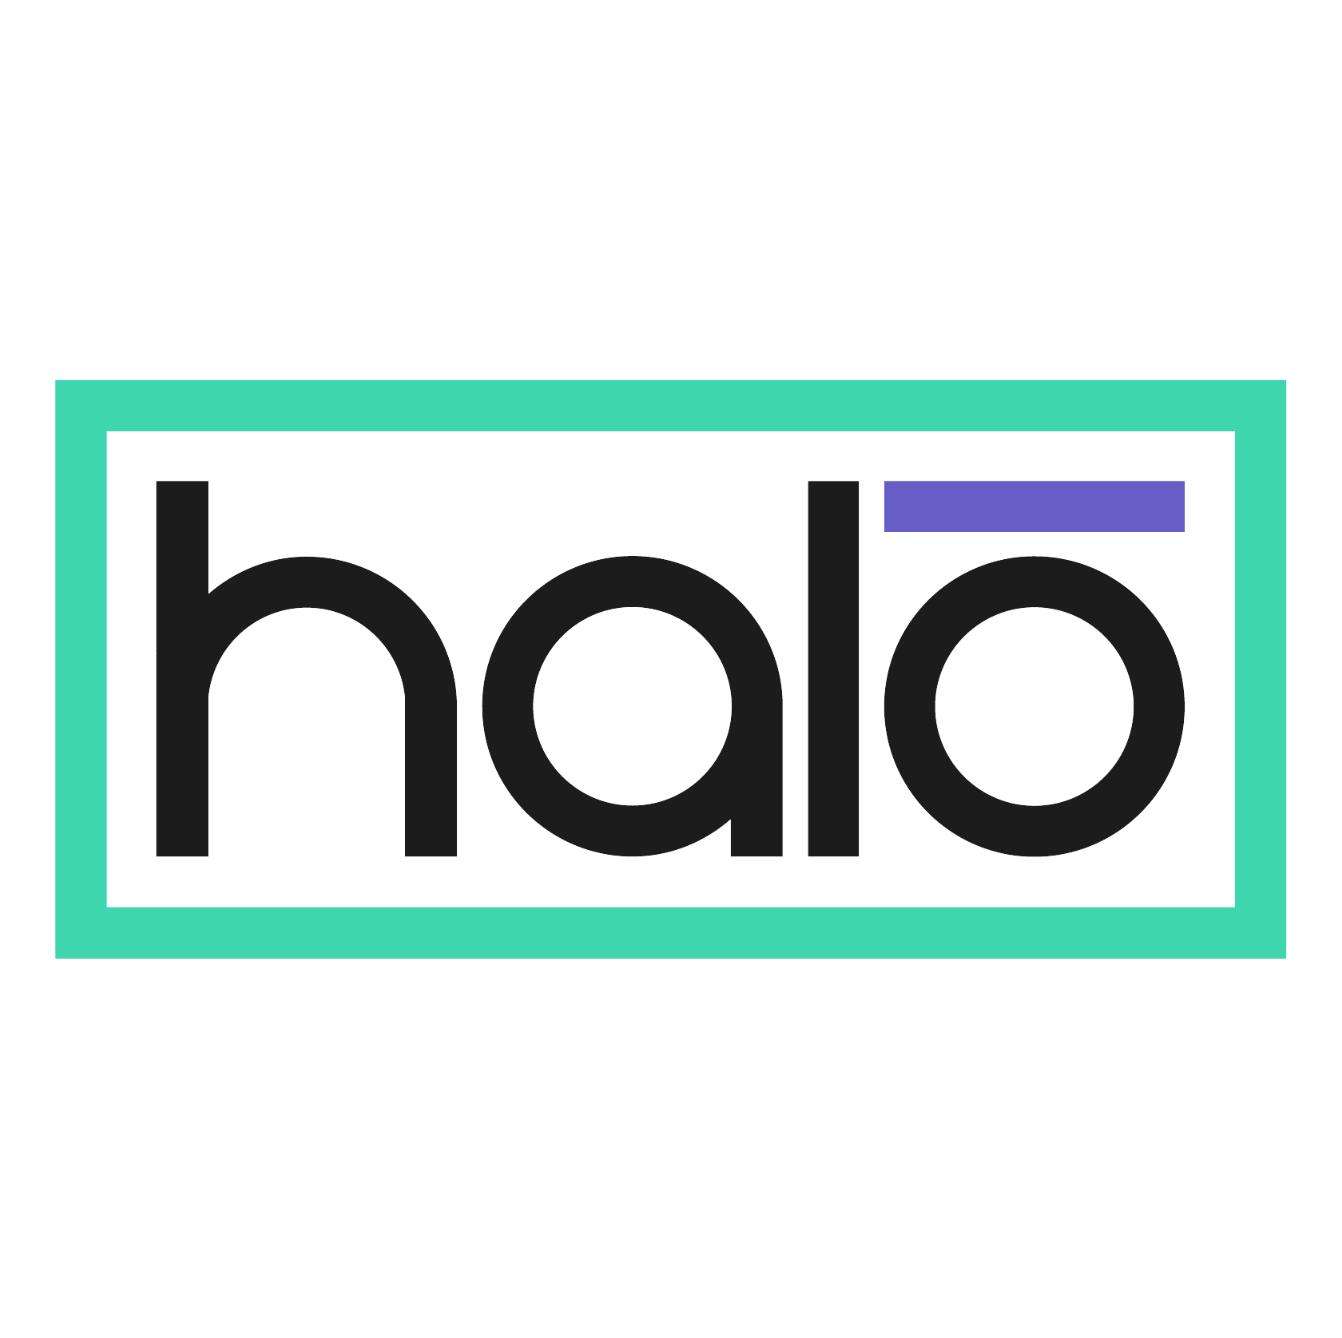 halo labs - Streamlining VR/AR design